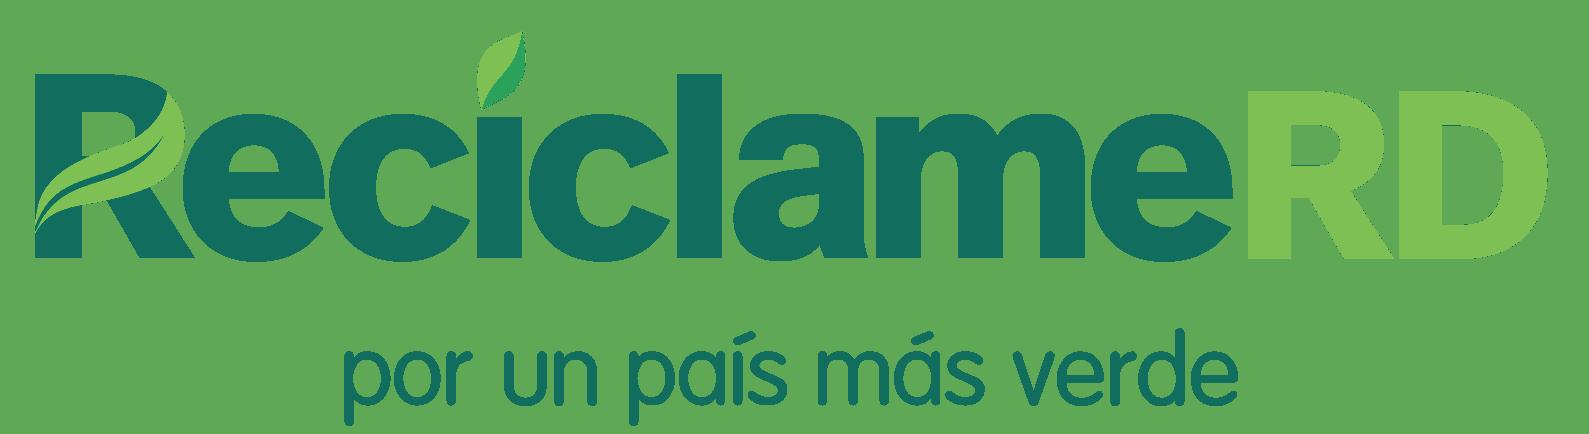 Logo Completo_RecíclameRD